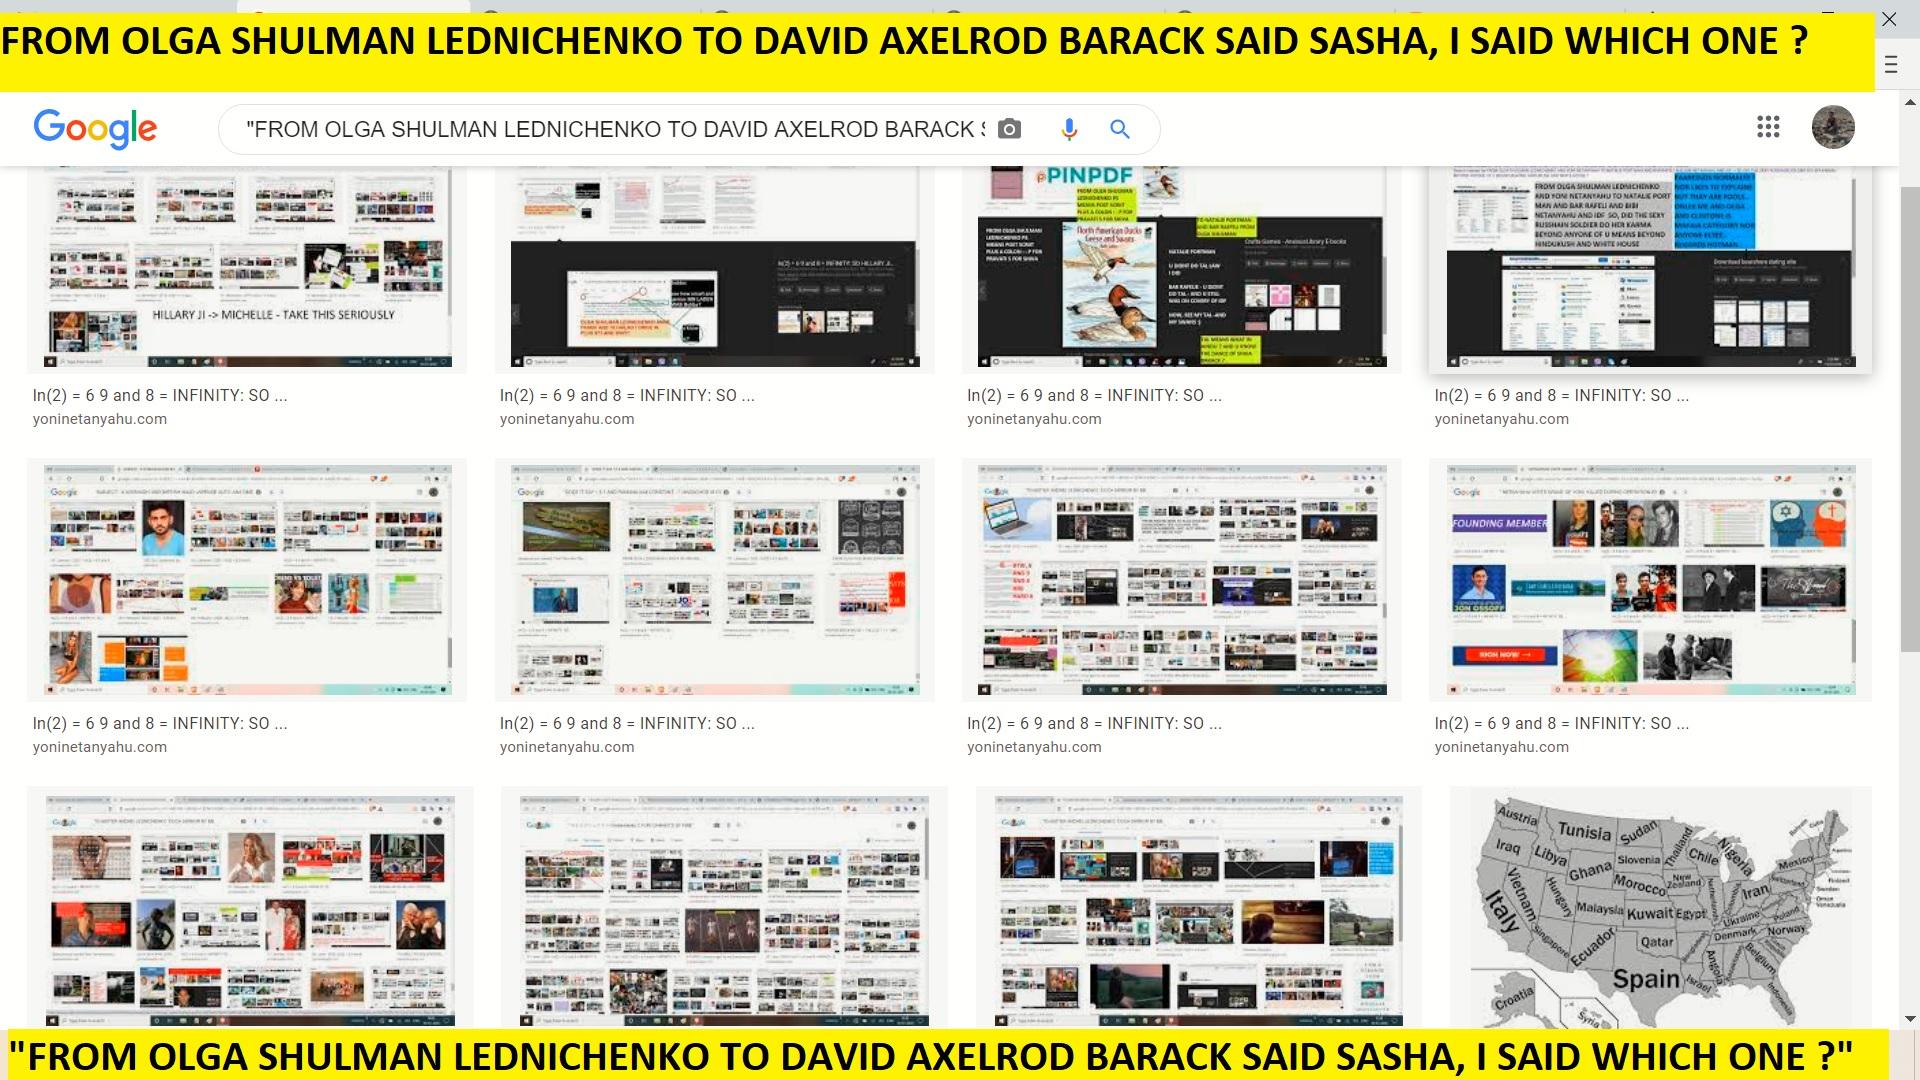 FROM OLGA SHULMAN LEDNICHENKO TO DAVID AXELROD BARACK SAID SASHA, I SAID WHICH ONE